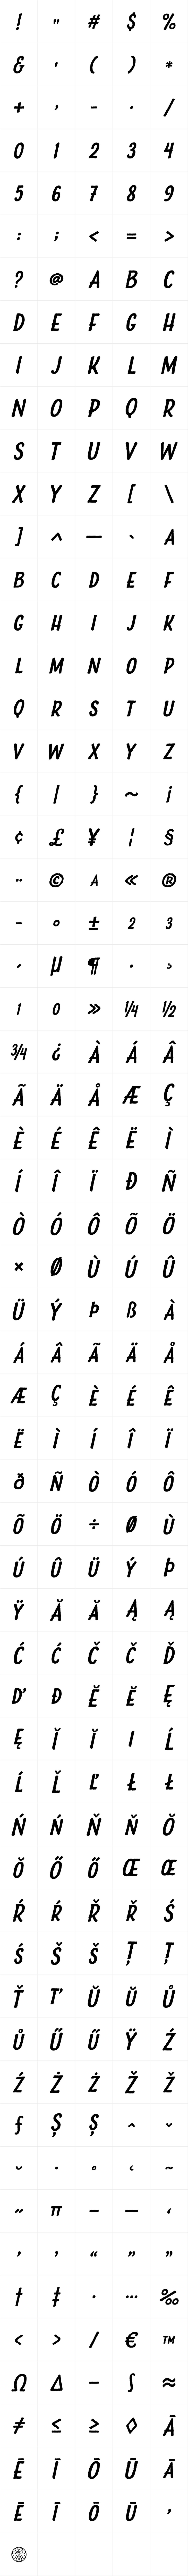 Charcuterie Sans Bold Italic